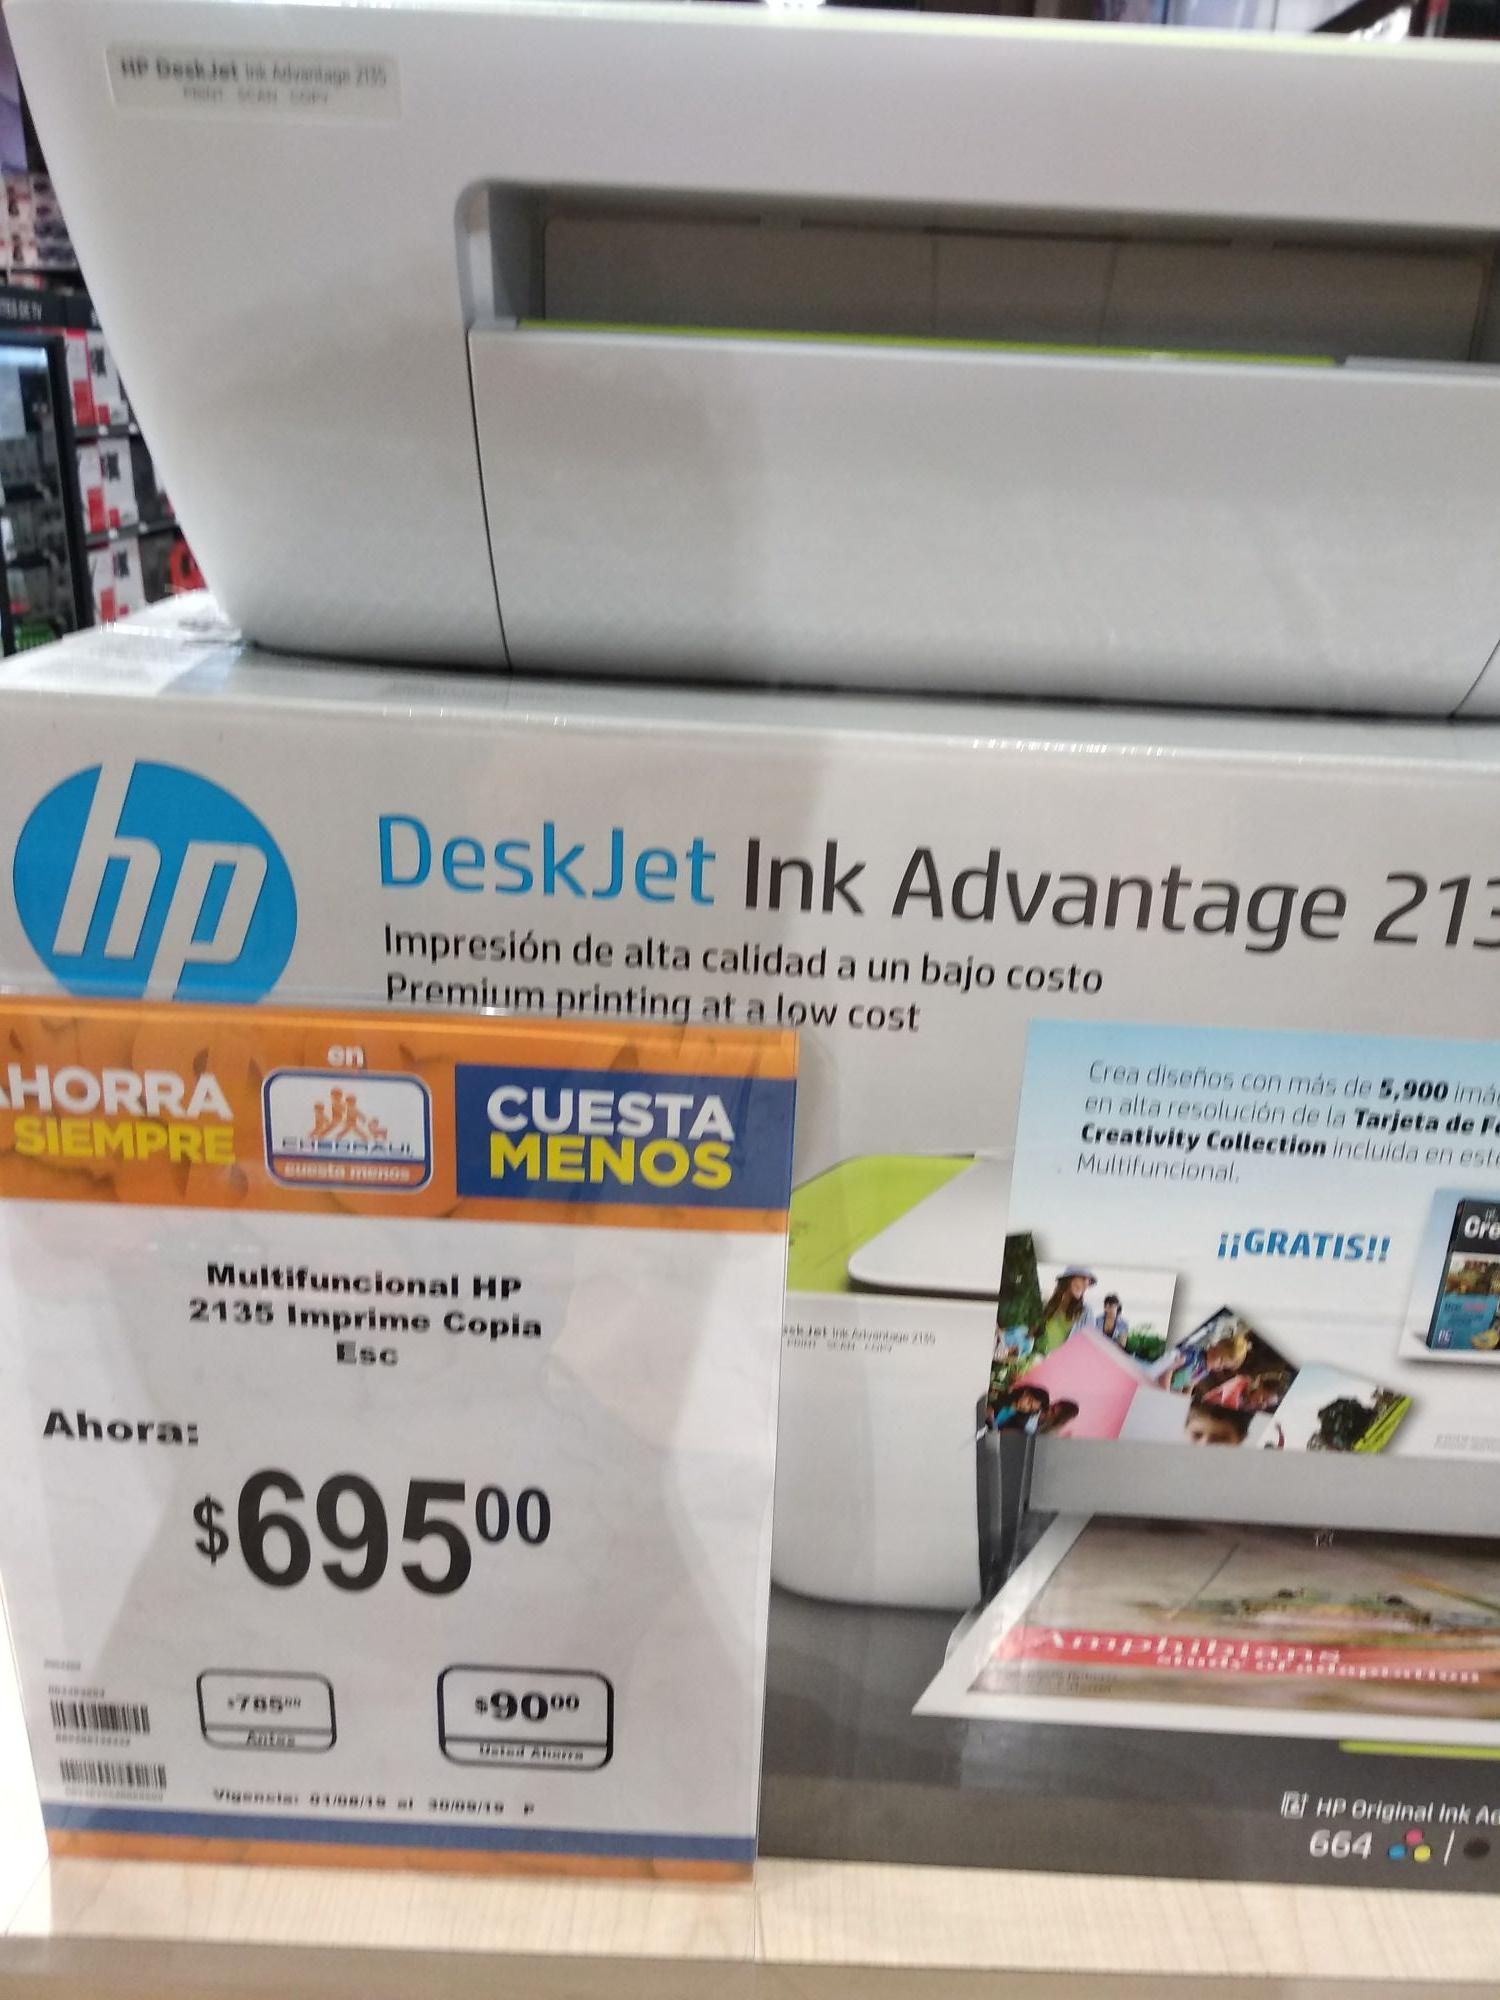 Chderaui: Impresora HP DeskJet Ink Advantange 213